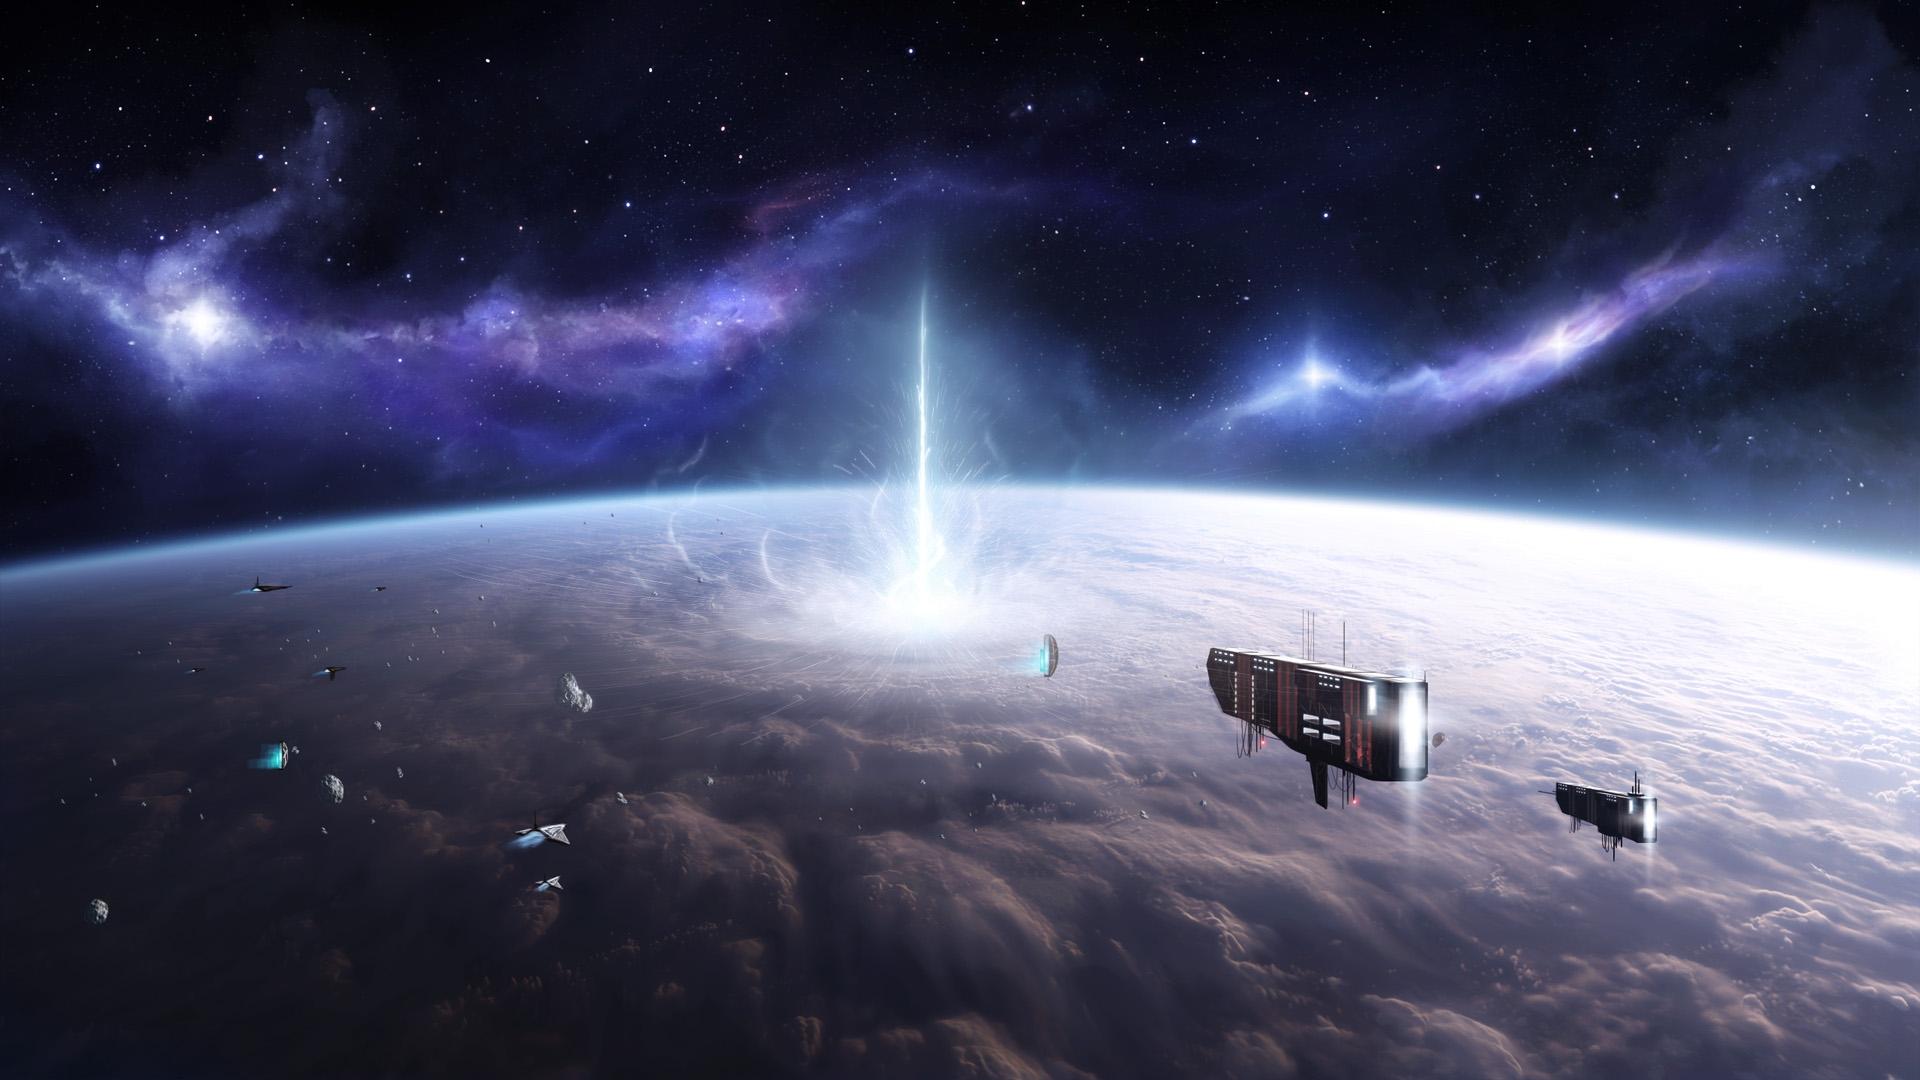 Fantascienza - Space  Planet Navicelle Spaziali Sfondi